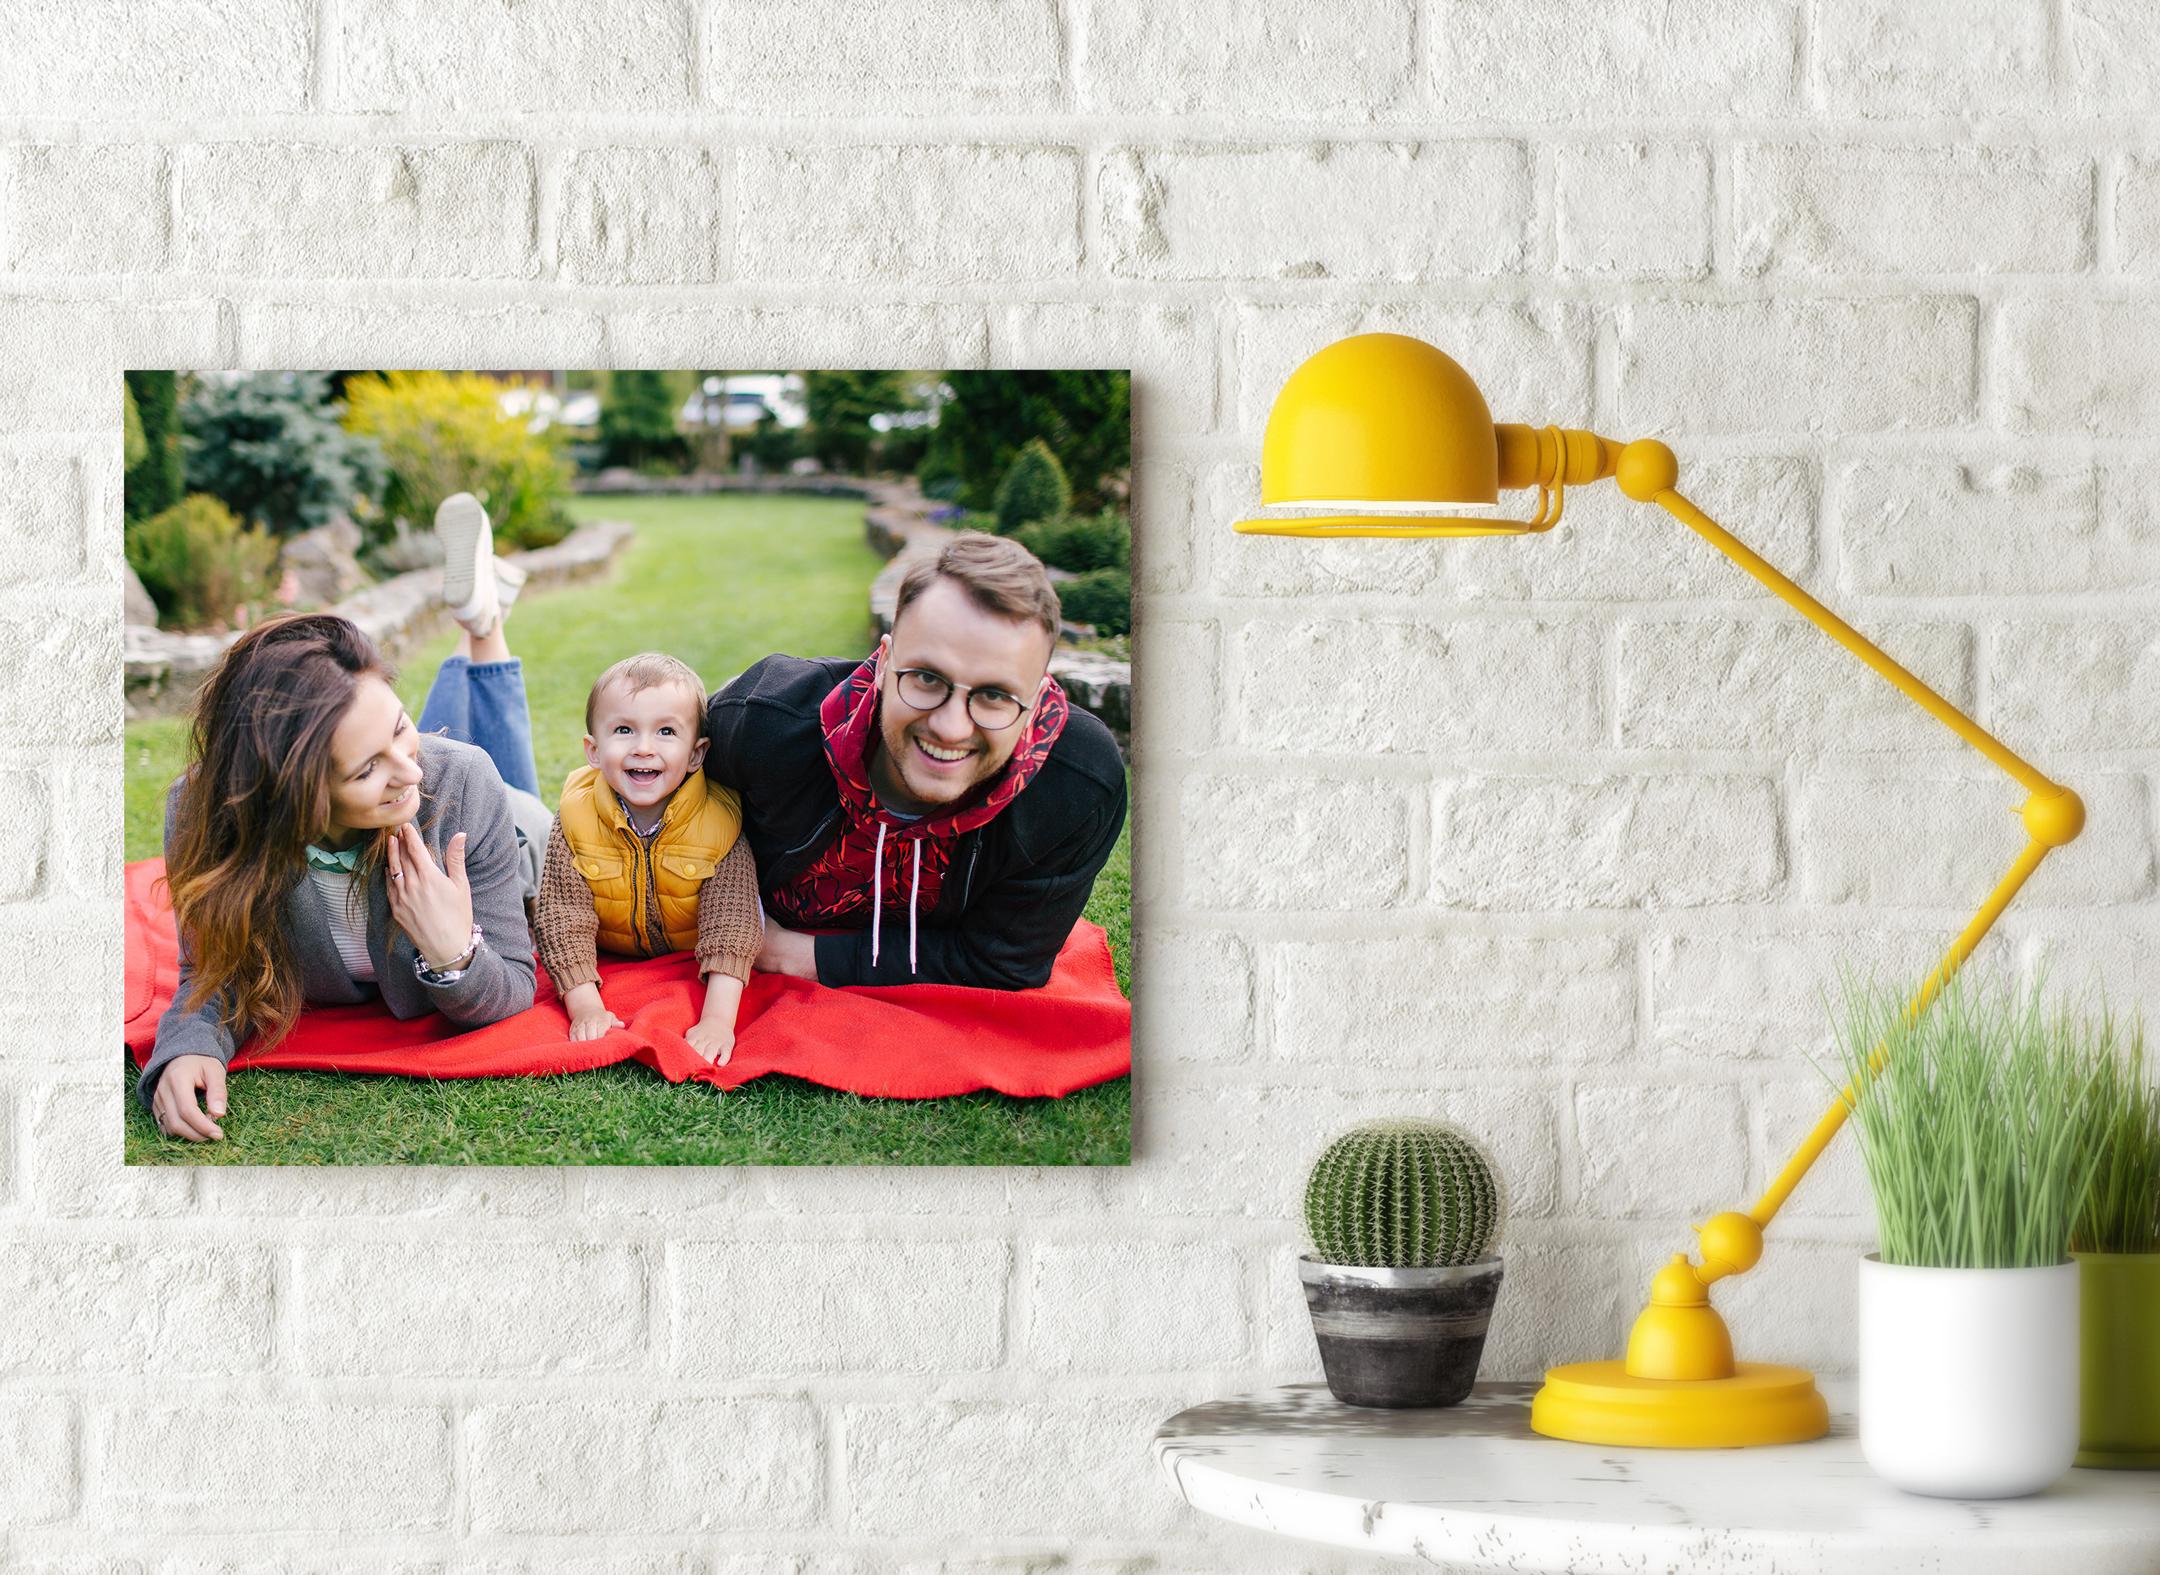 Canvas-Home-decor-23.jpg